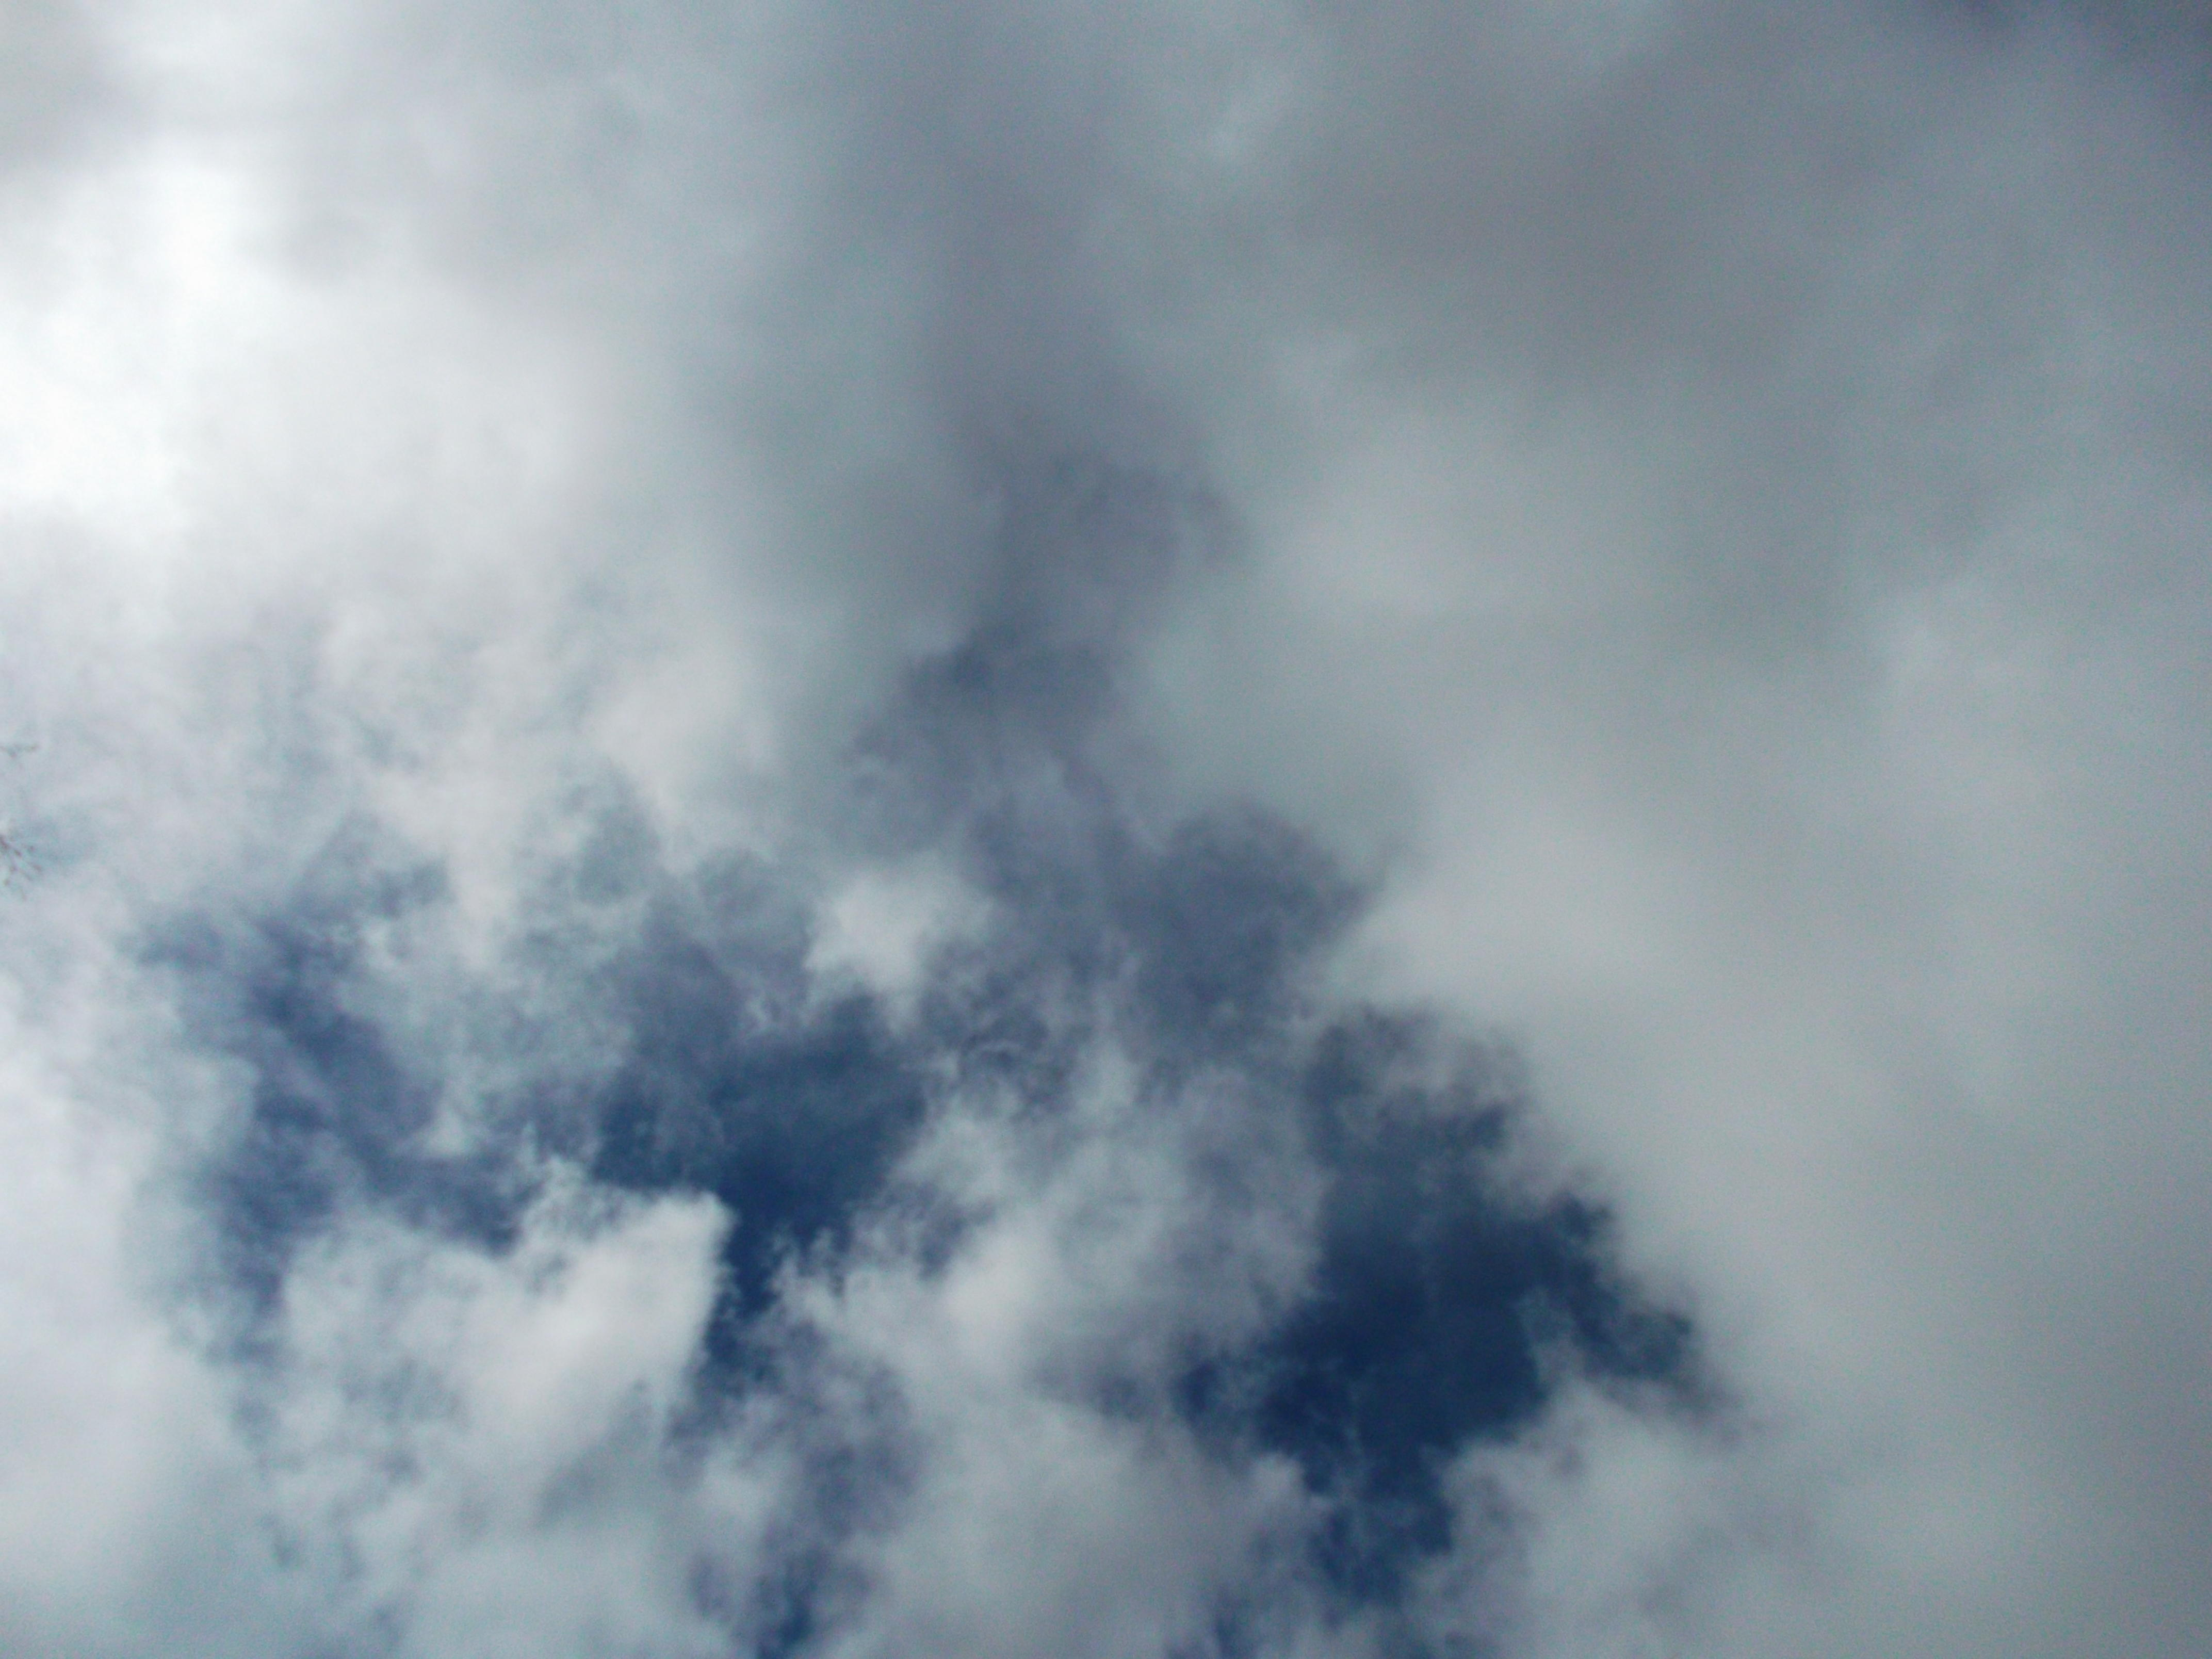 2013-02-28 Longitude -0.371 Latitude 49.182 Altitude 29 Heure 12h34